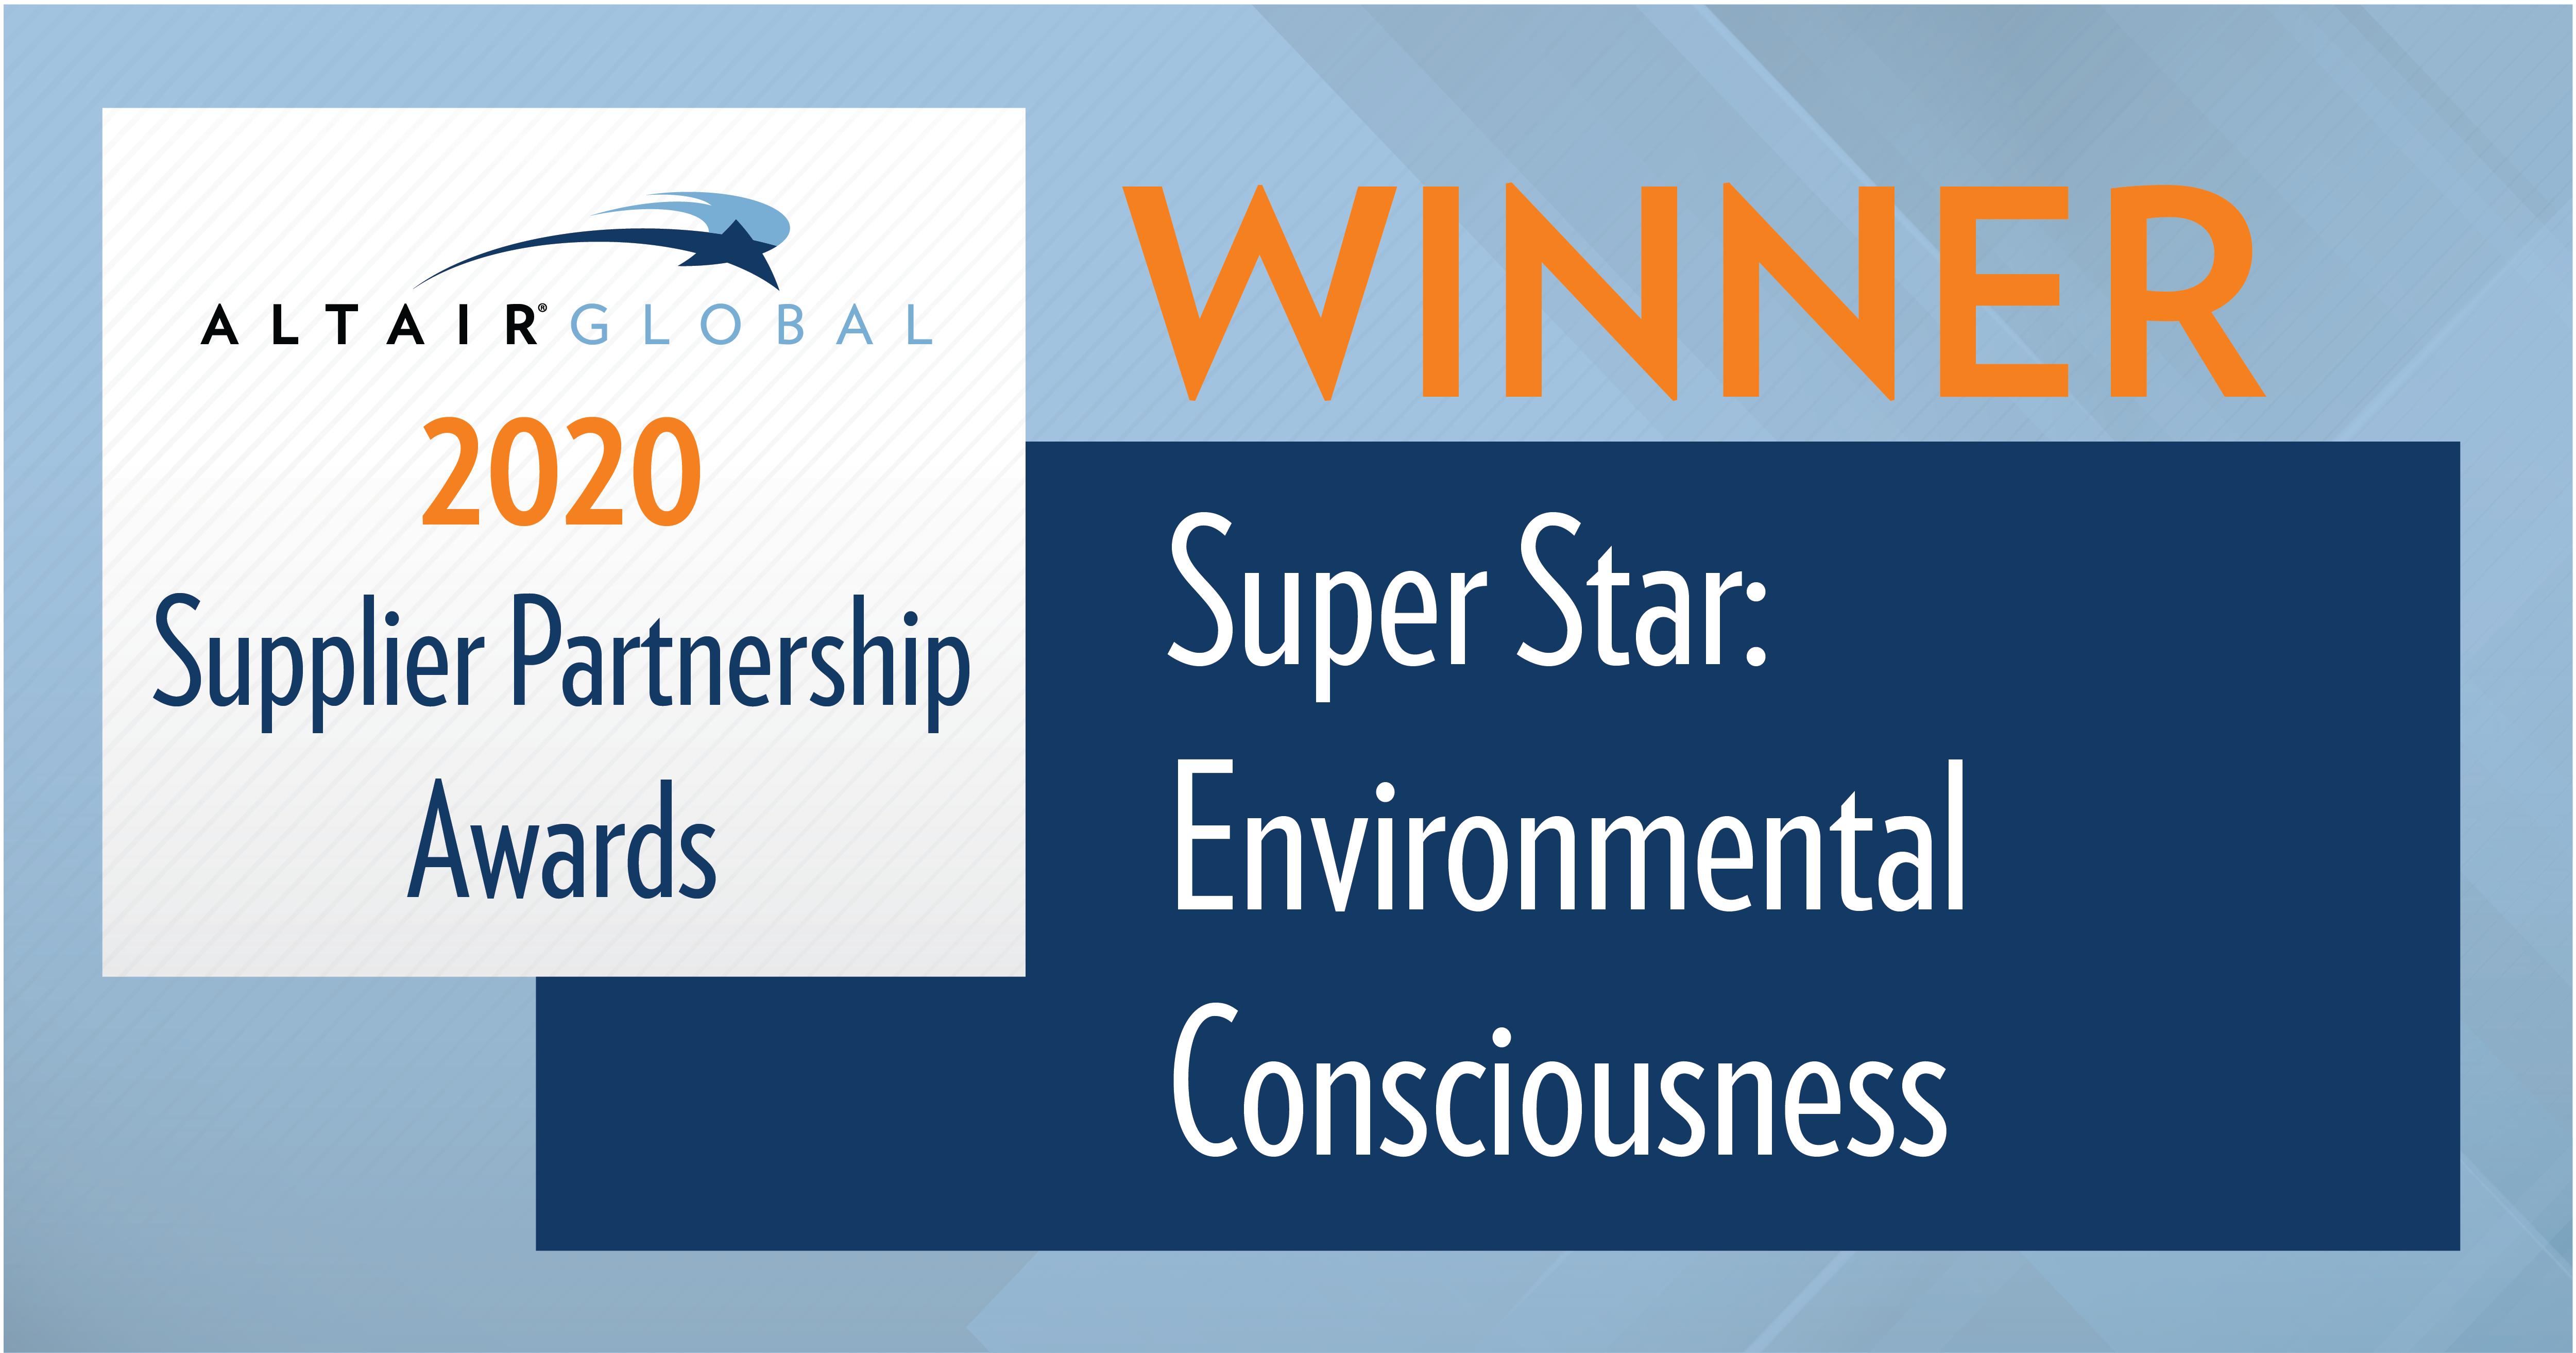 New World Van Lines Receives Super Star Award for Environmental Consciousness